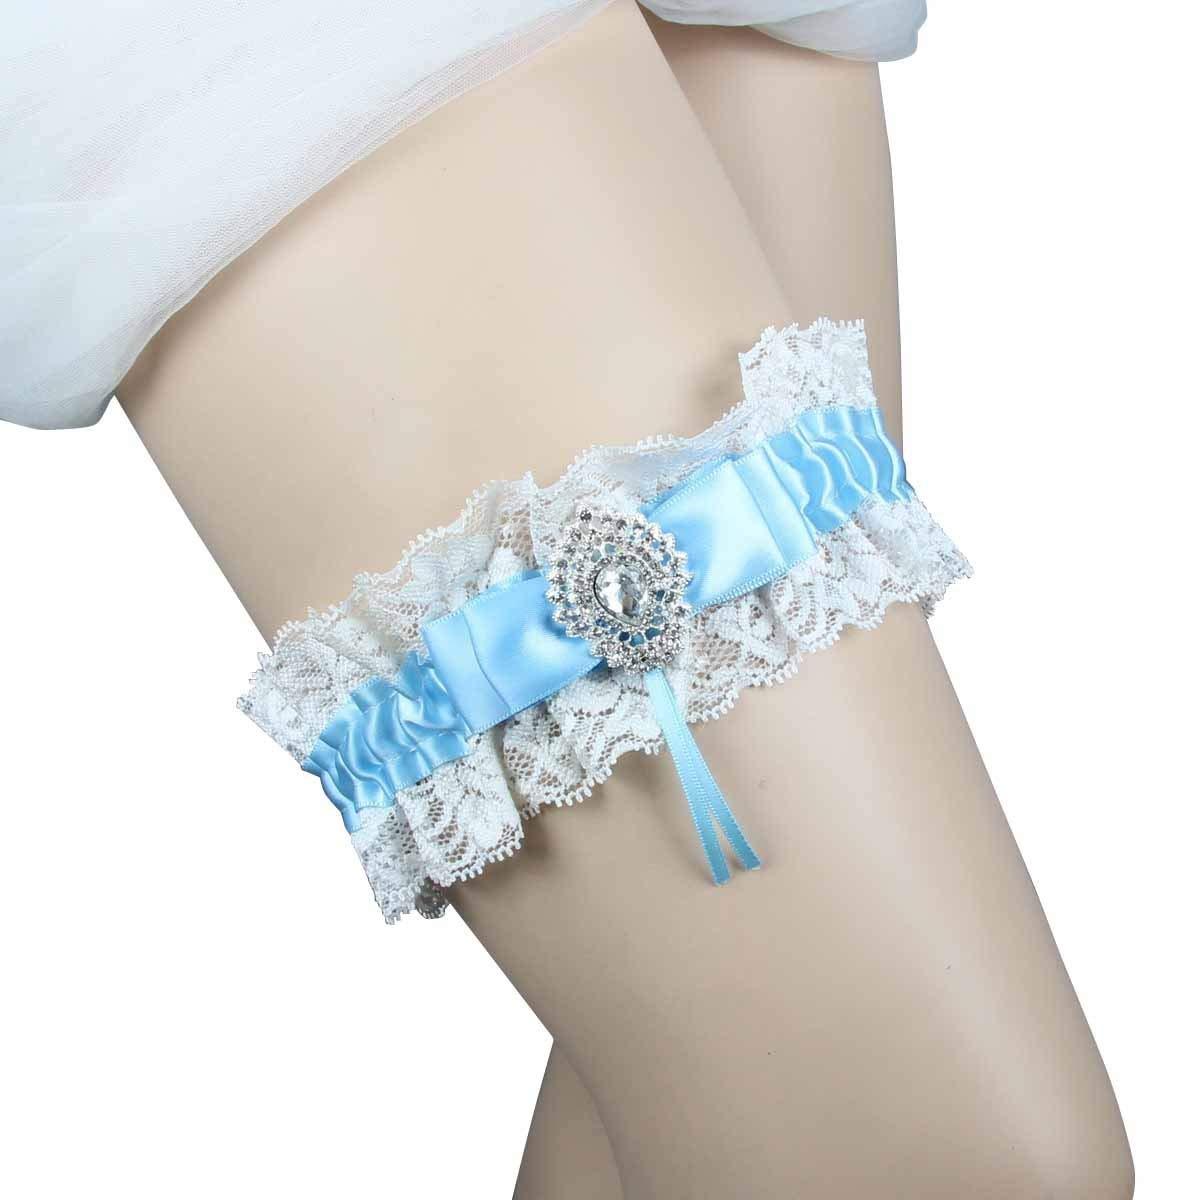 IUMN Wedding Garter Blue Lace With Rhinestone Handmade Bride Garter Belt  (14-24 Inch